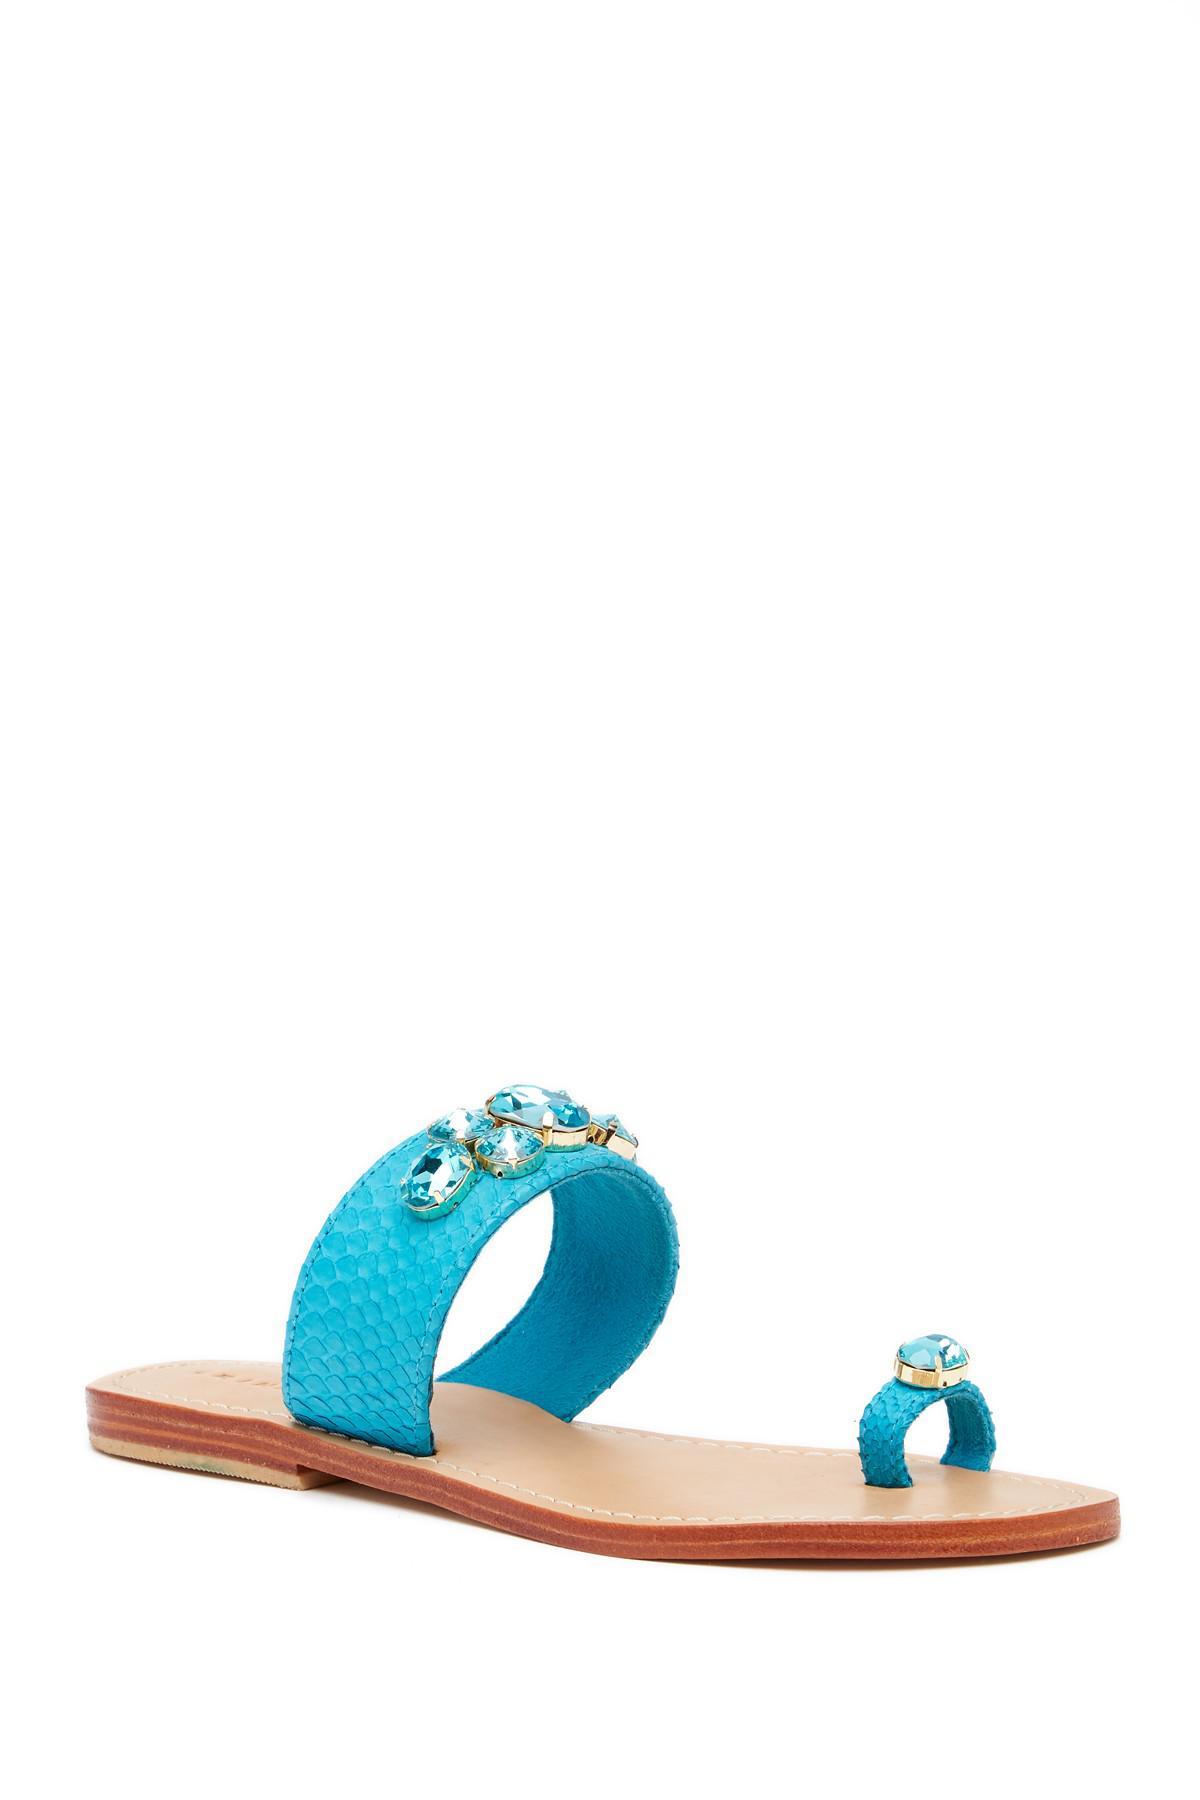 Trina Turk Turquesa Embellished Slip-On Sandal fFivlmdY6n